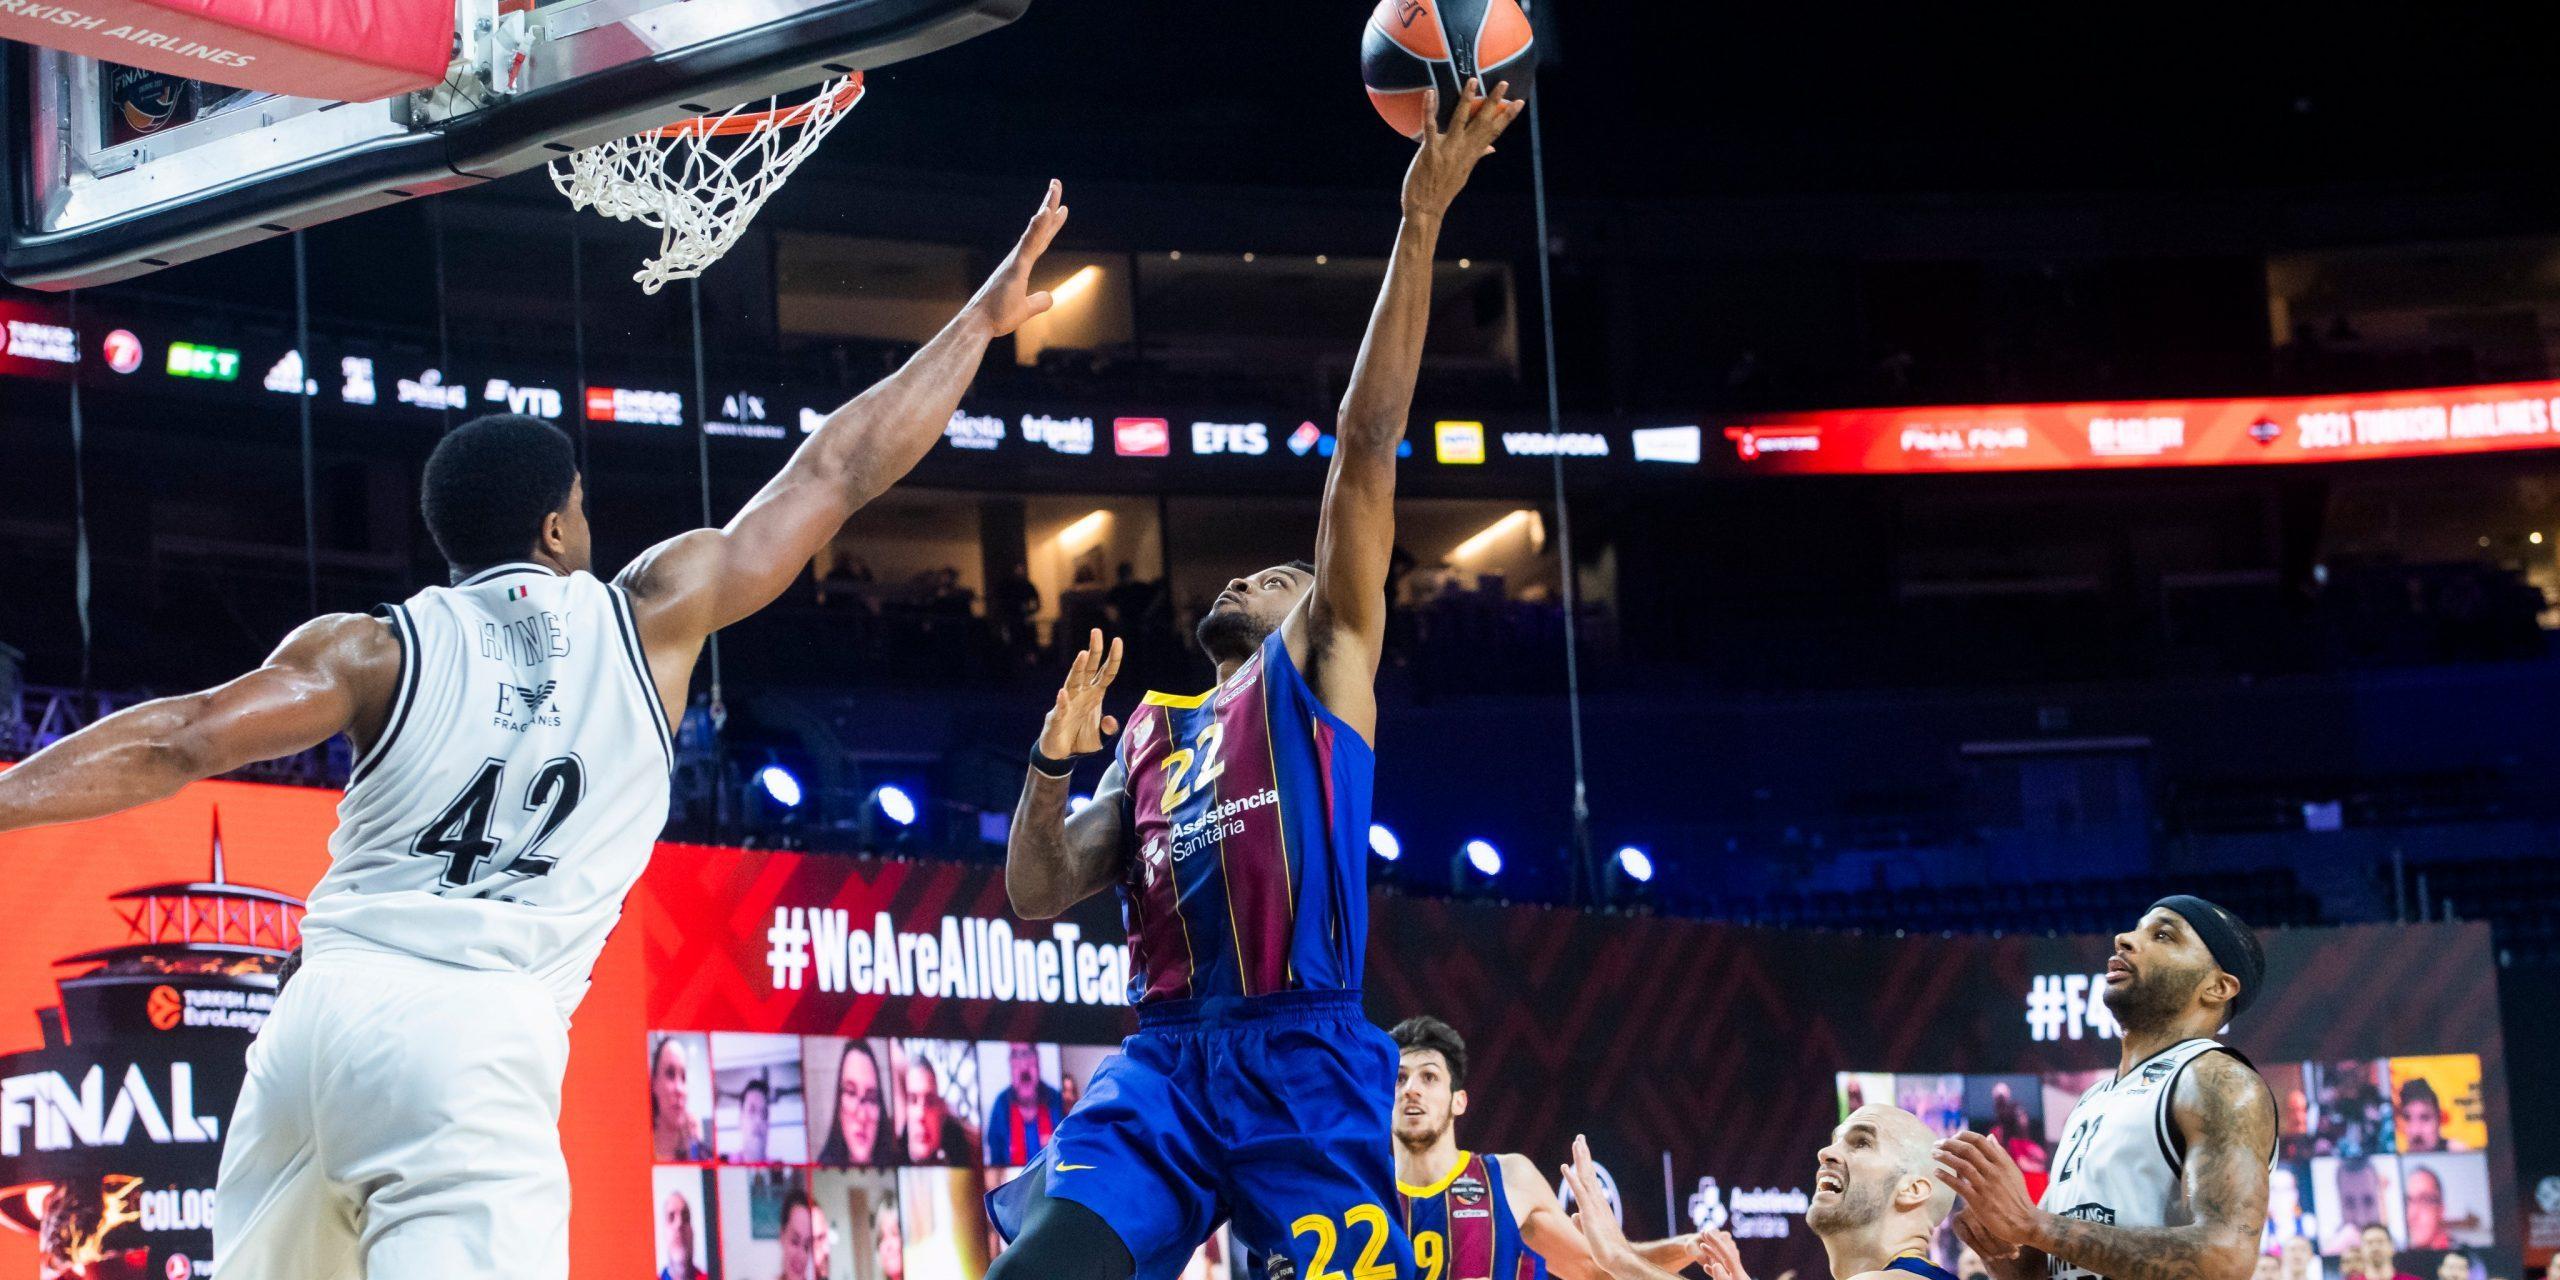 Cory Higgins, heroi del Barça a la 'Final Four' | FC Barcelona